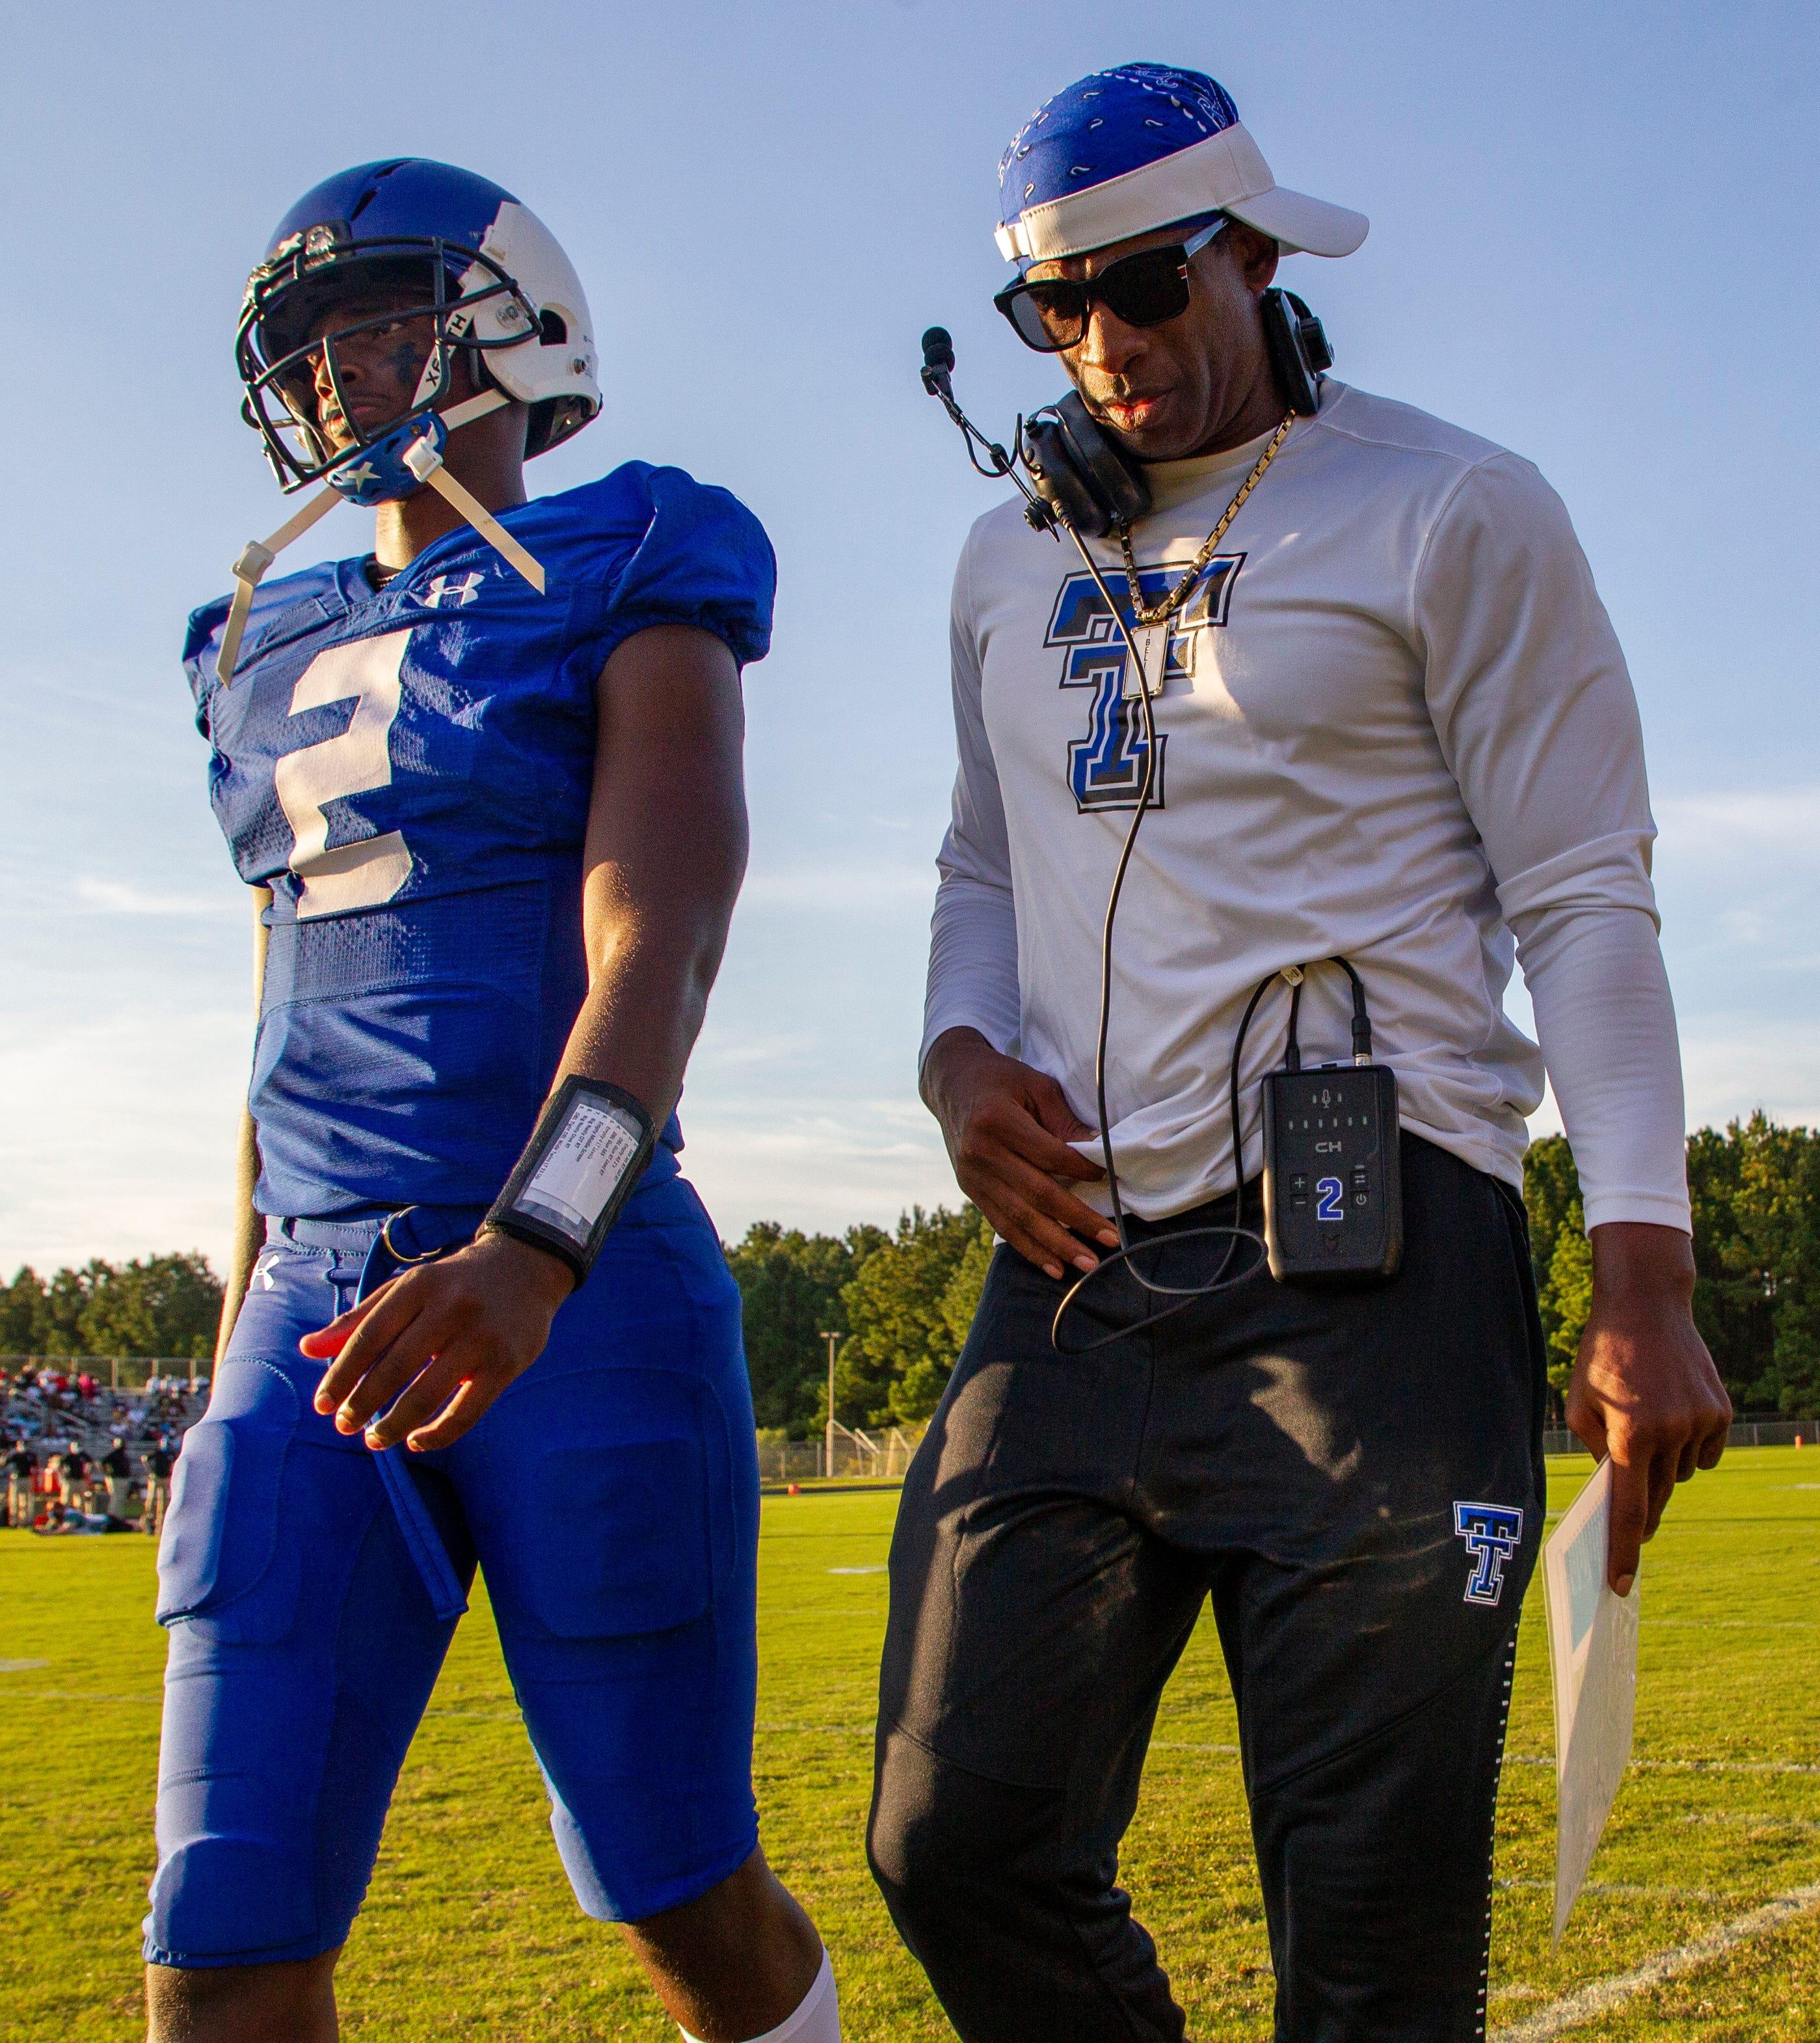 Deion Sanders lands his best recruit at Jackson State: his son, Shedeur Sanders